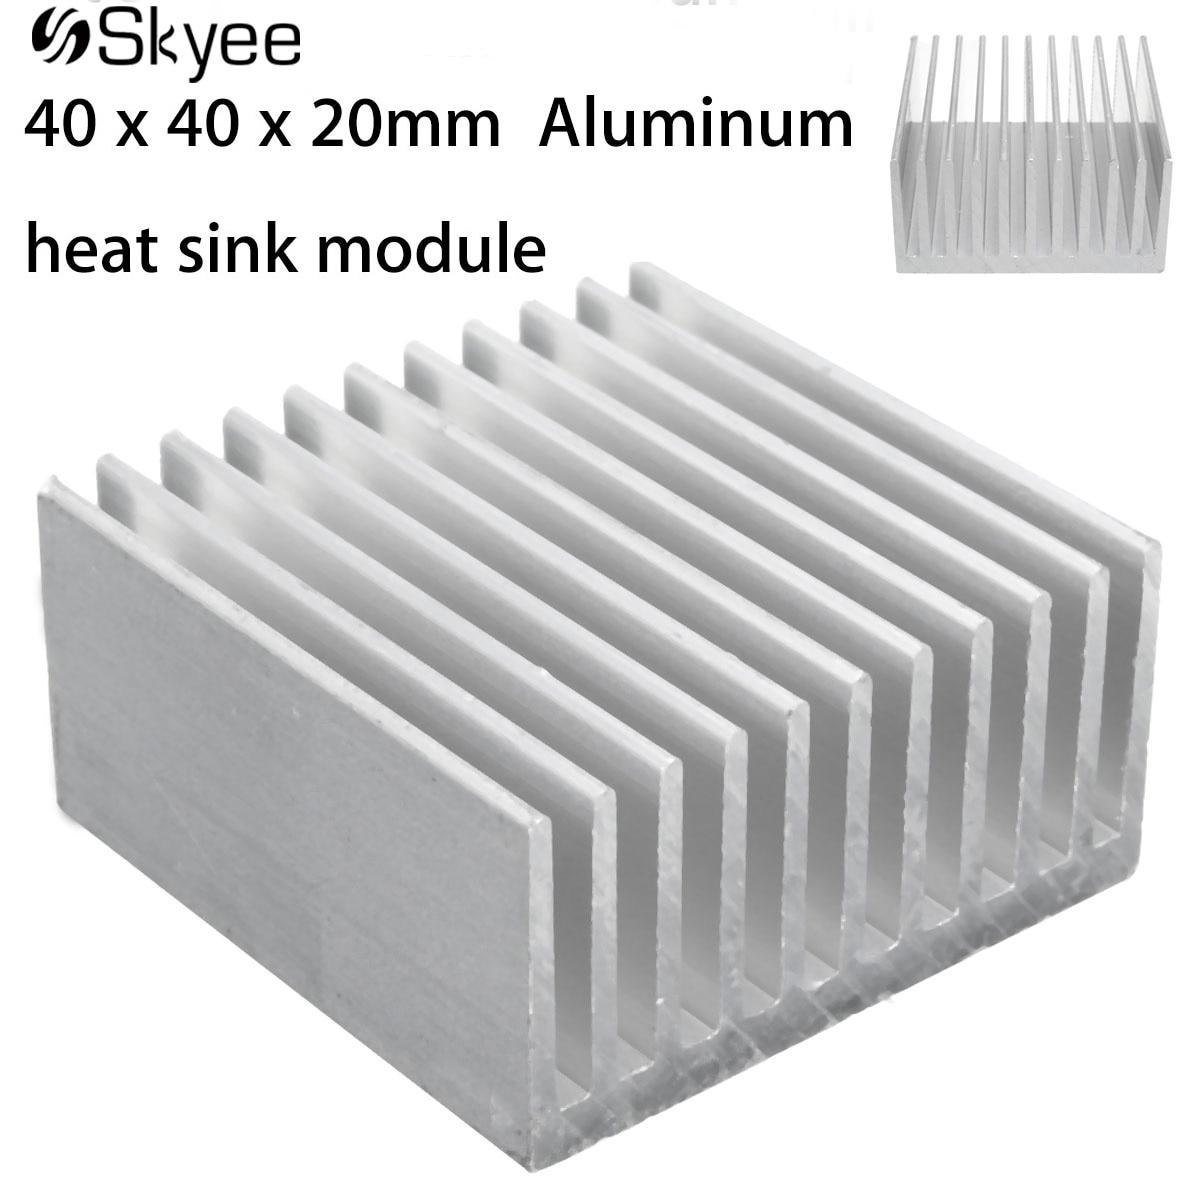 40x40x20mm Aluminum Heat Sink Radiator Heat Sink IC Heatsink Cooling Fin For CPU LED Power Cooling Thermal Module Wholesale